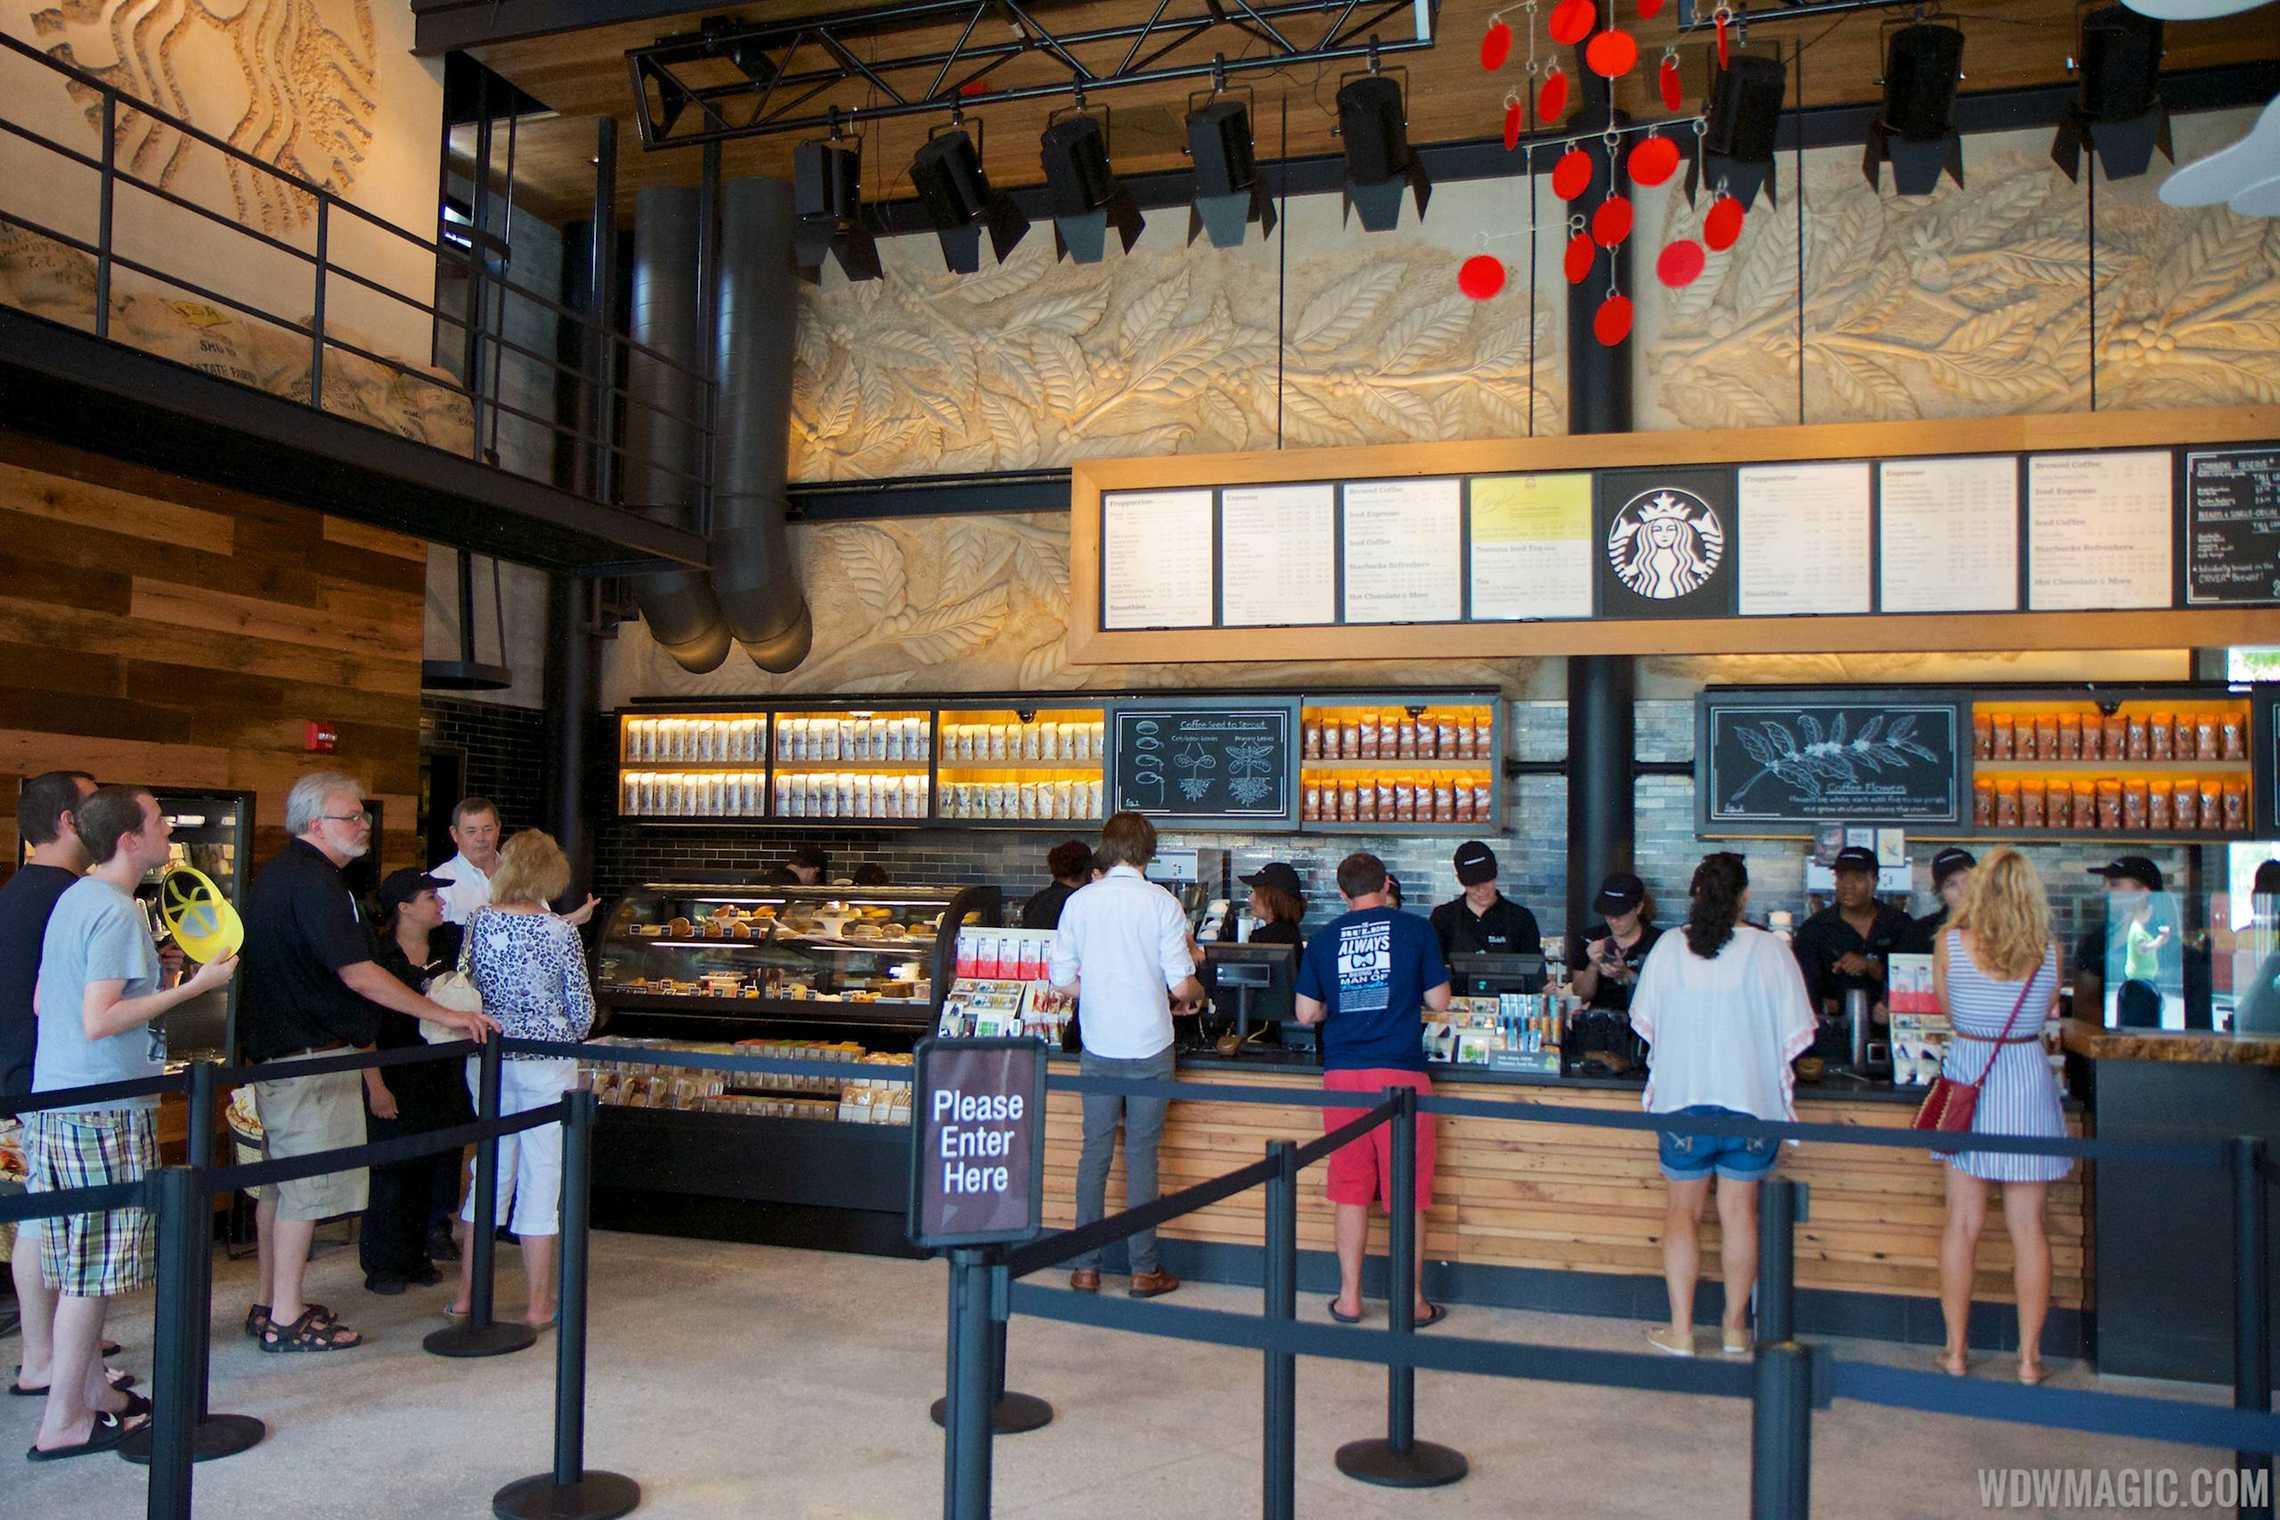 Inside the Starbucks West Side